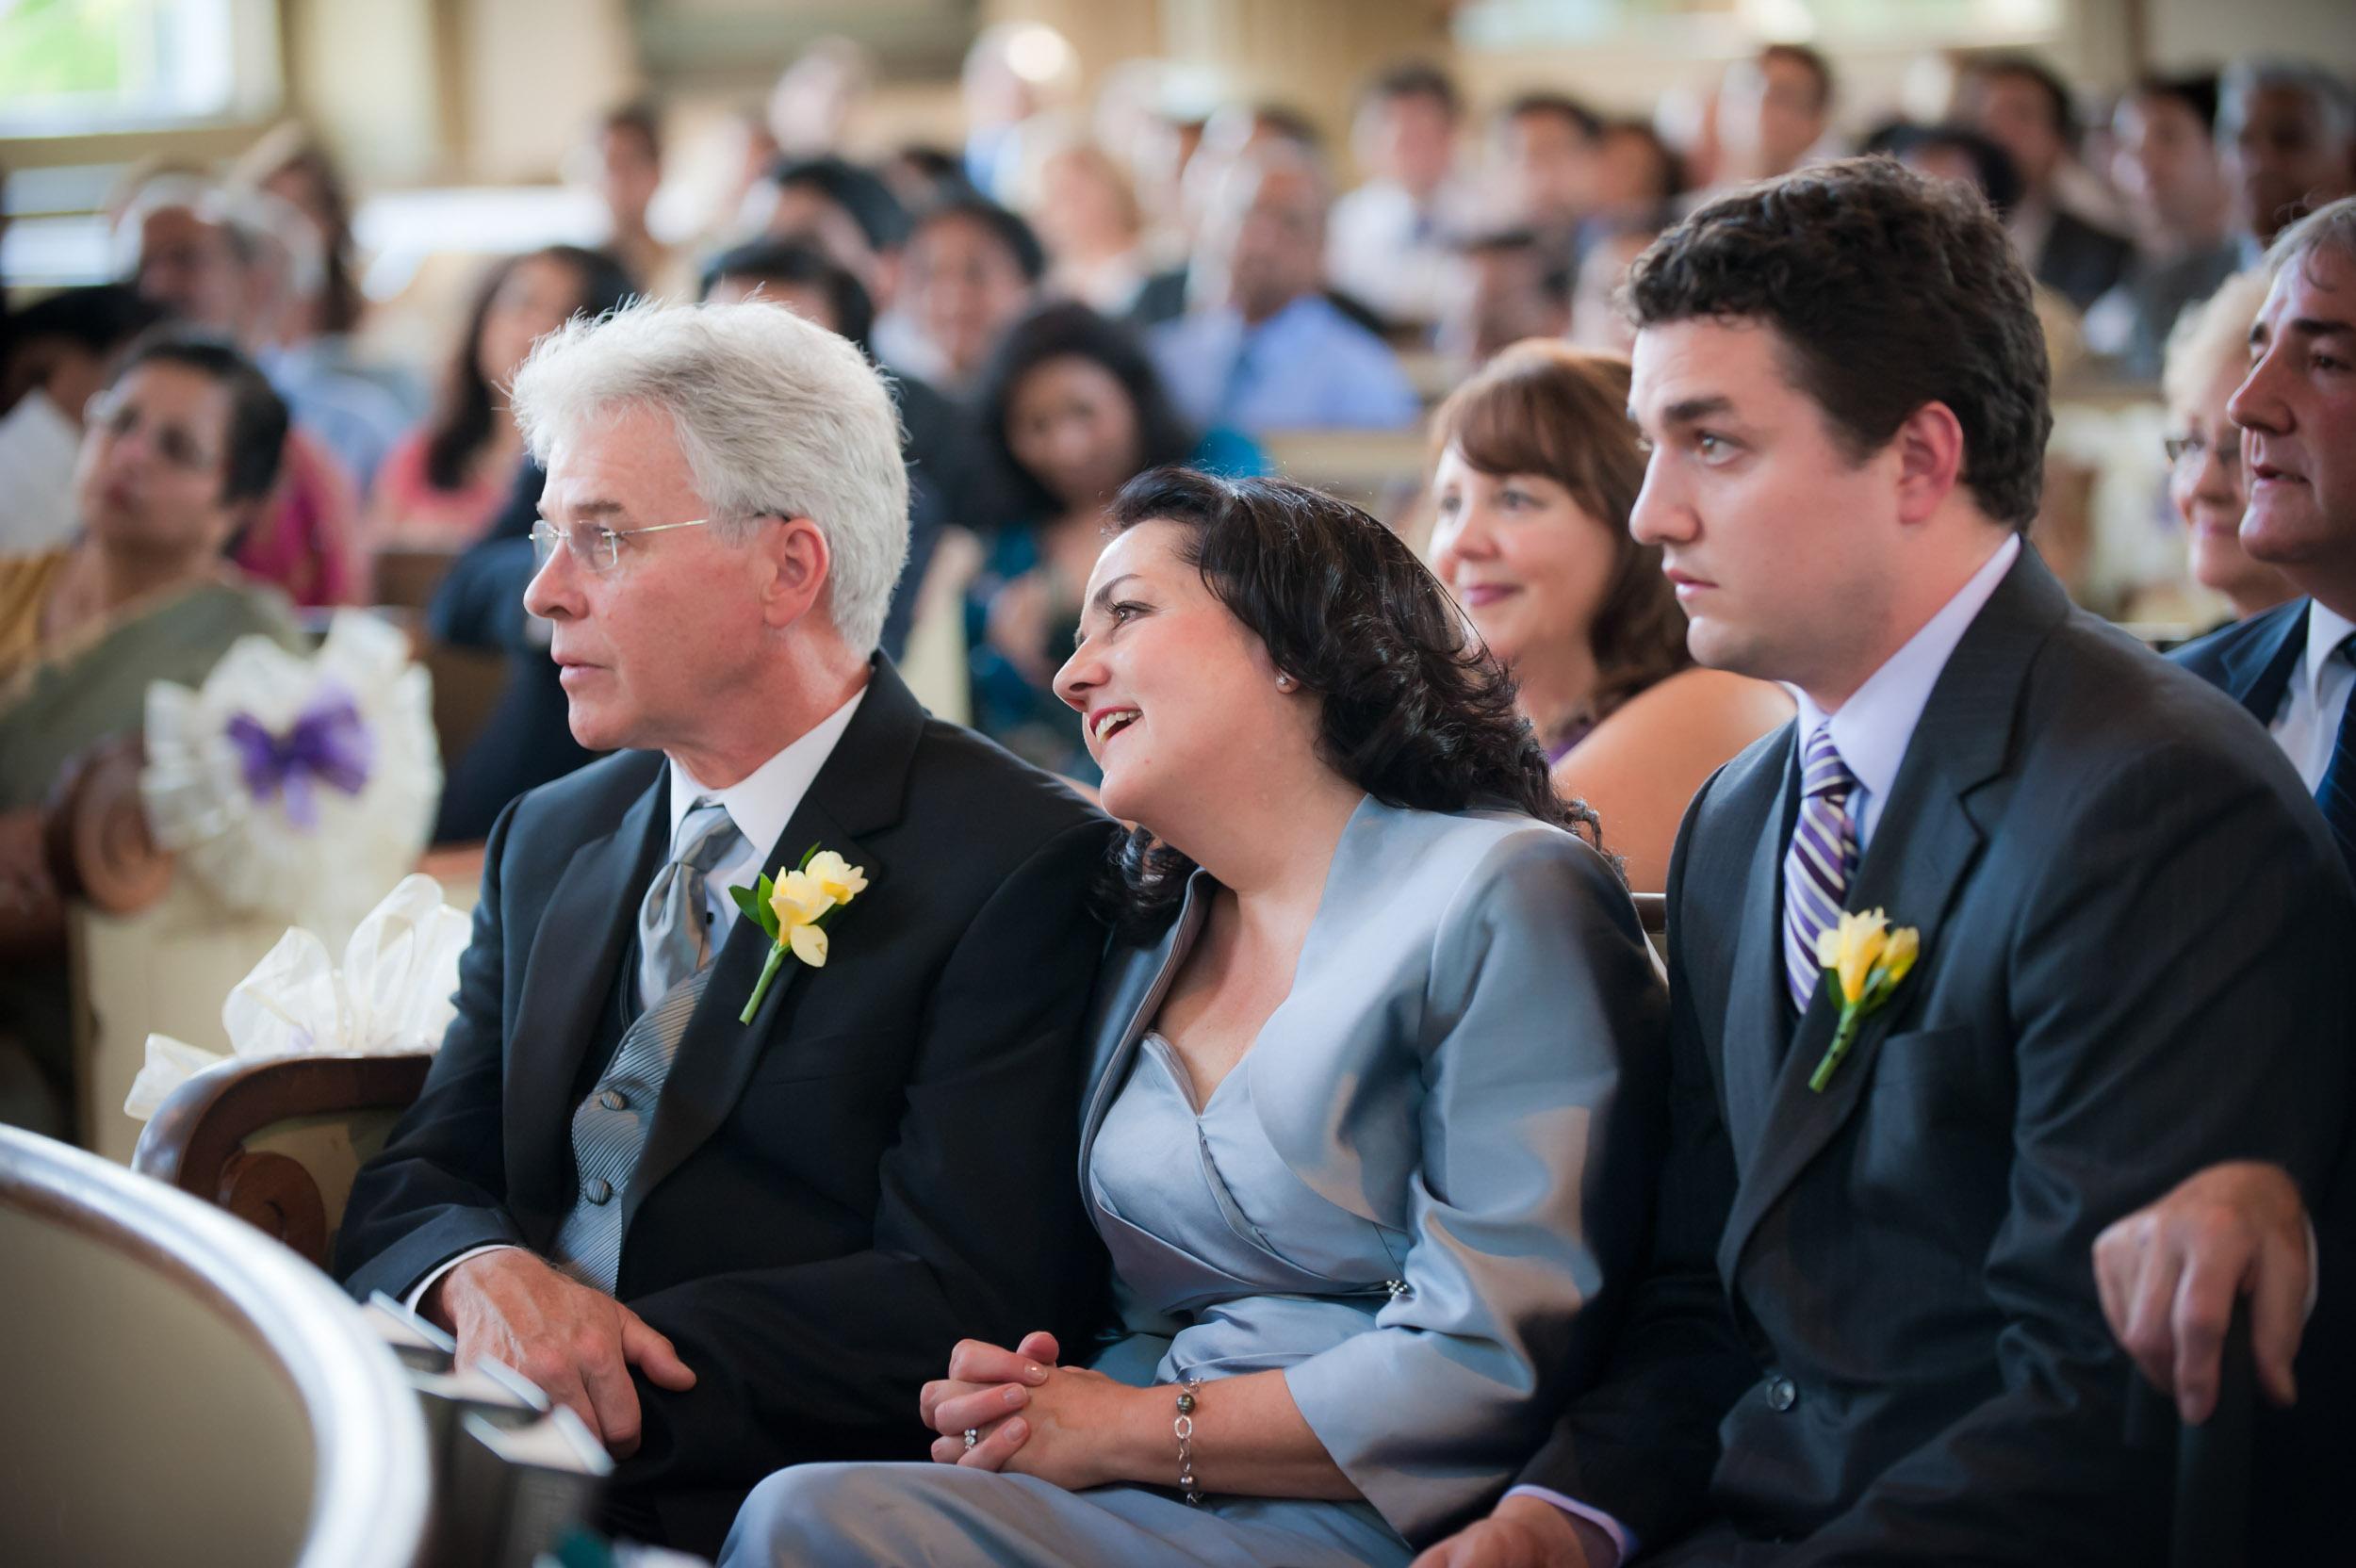 Wedding51Happy_parents_of _bride-2.jpg